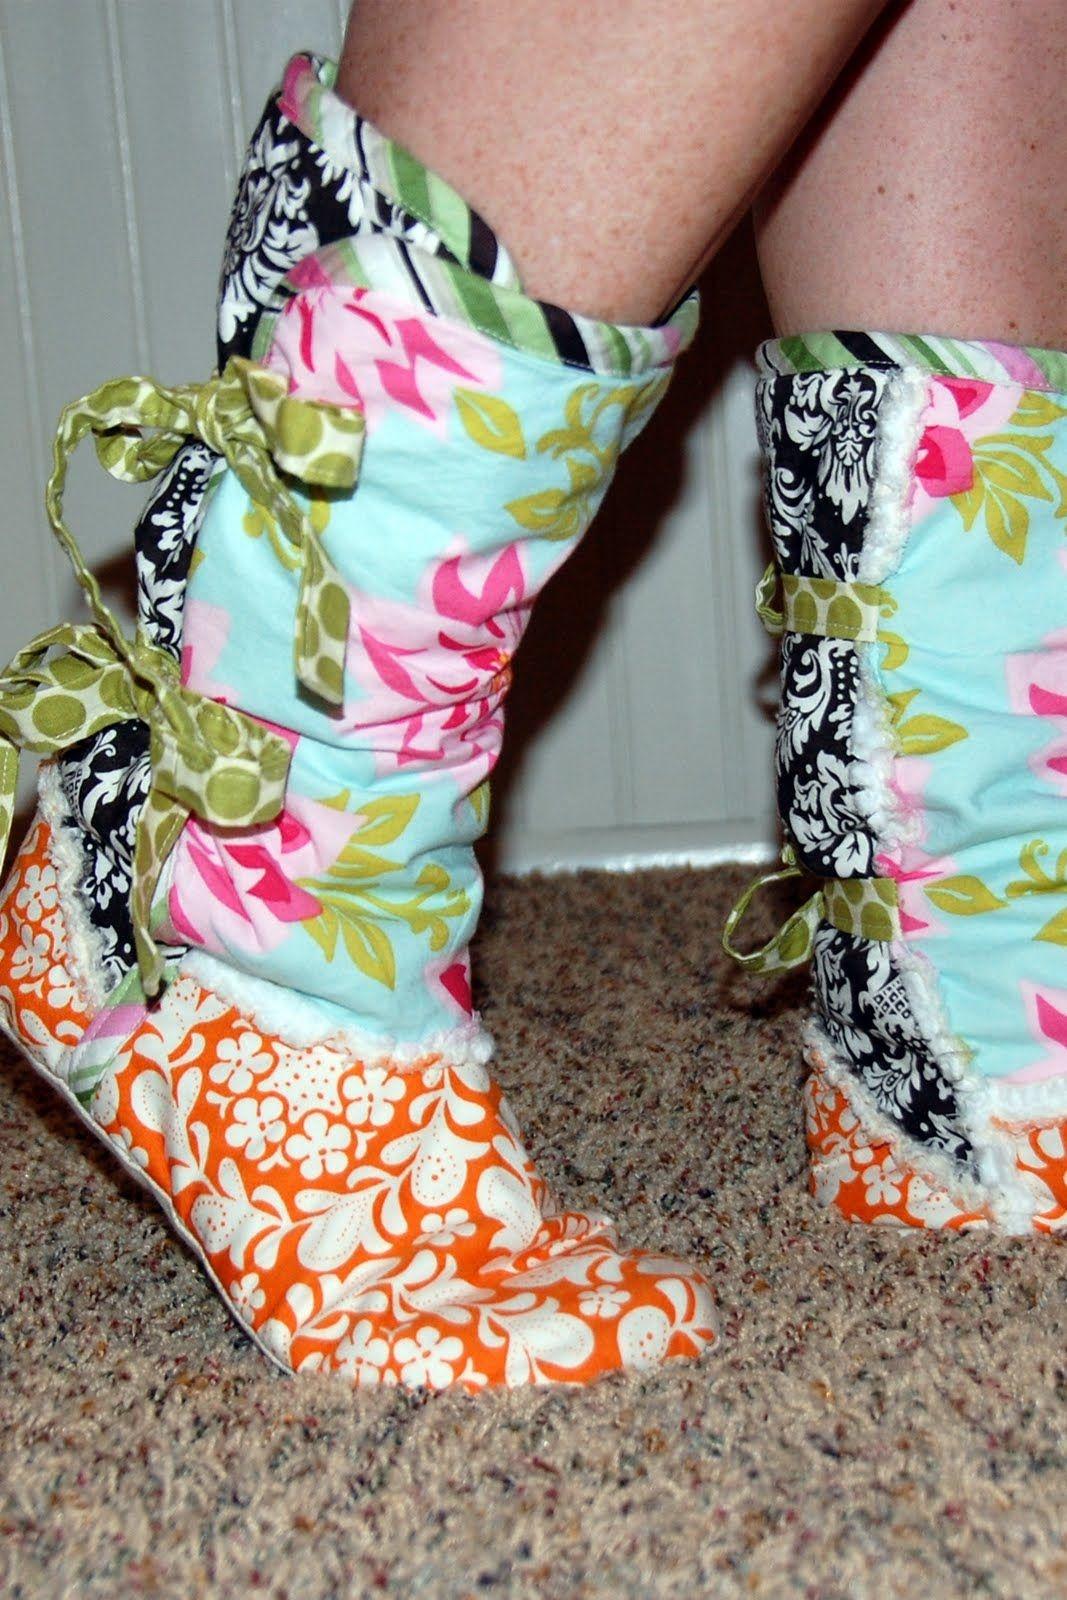 Printable Fleece Slipper Pattern | Fleece Moccasin Slipper Boots - Free Printable Fleece Sock Pattern